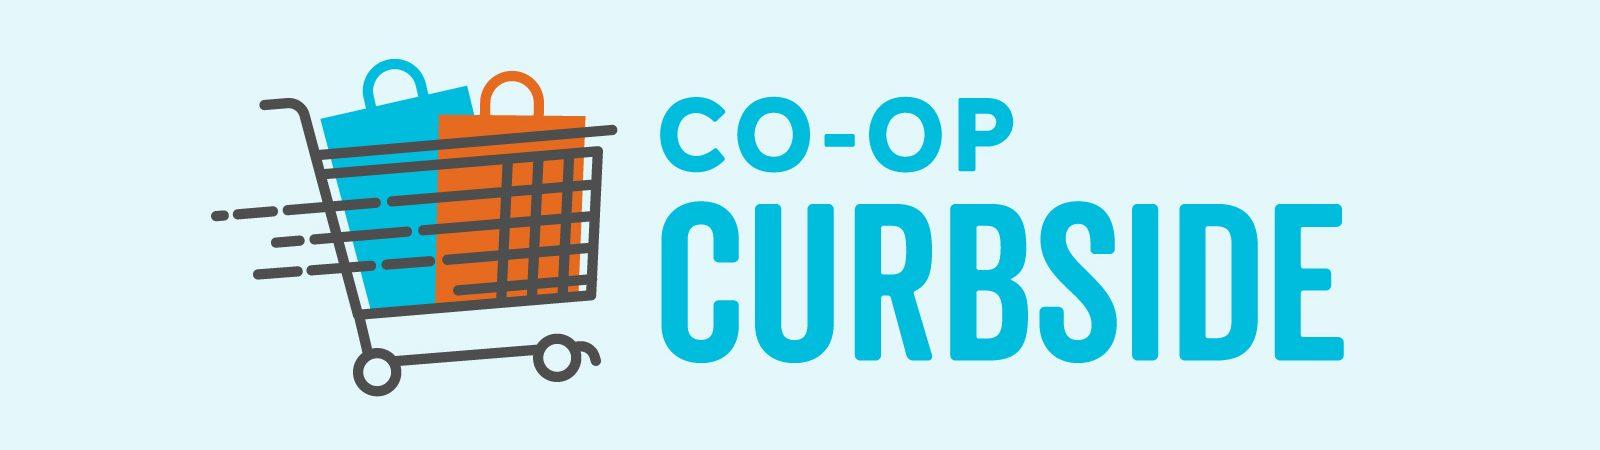 Co-op Curbside Grocery Pickup